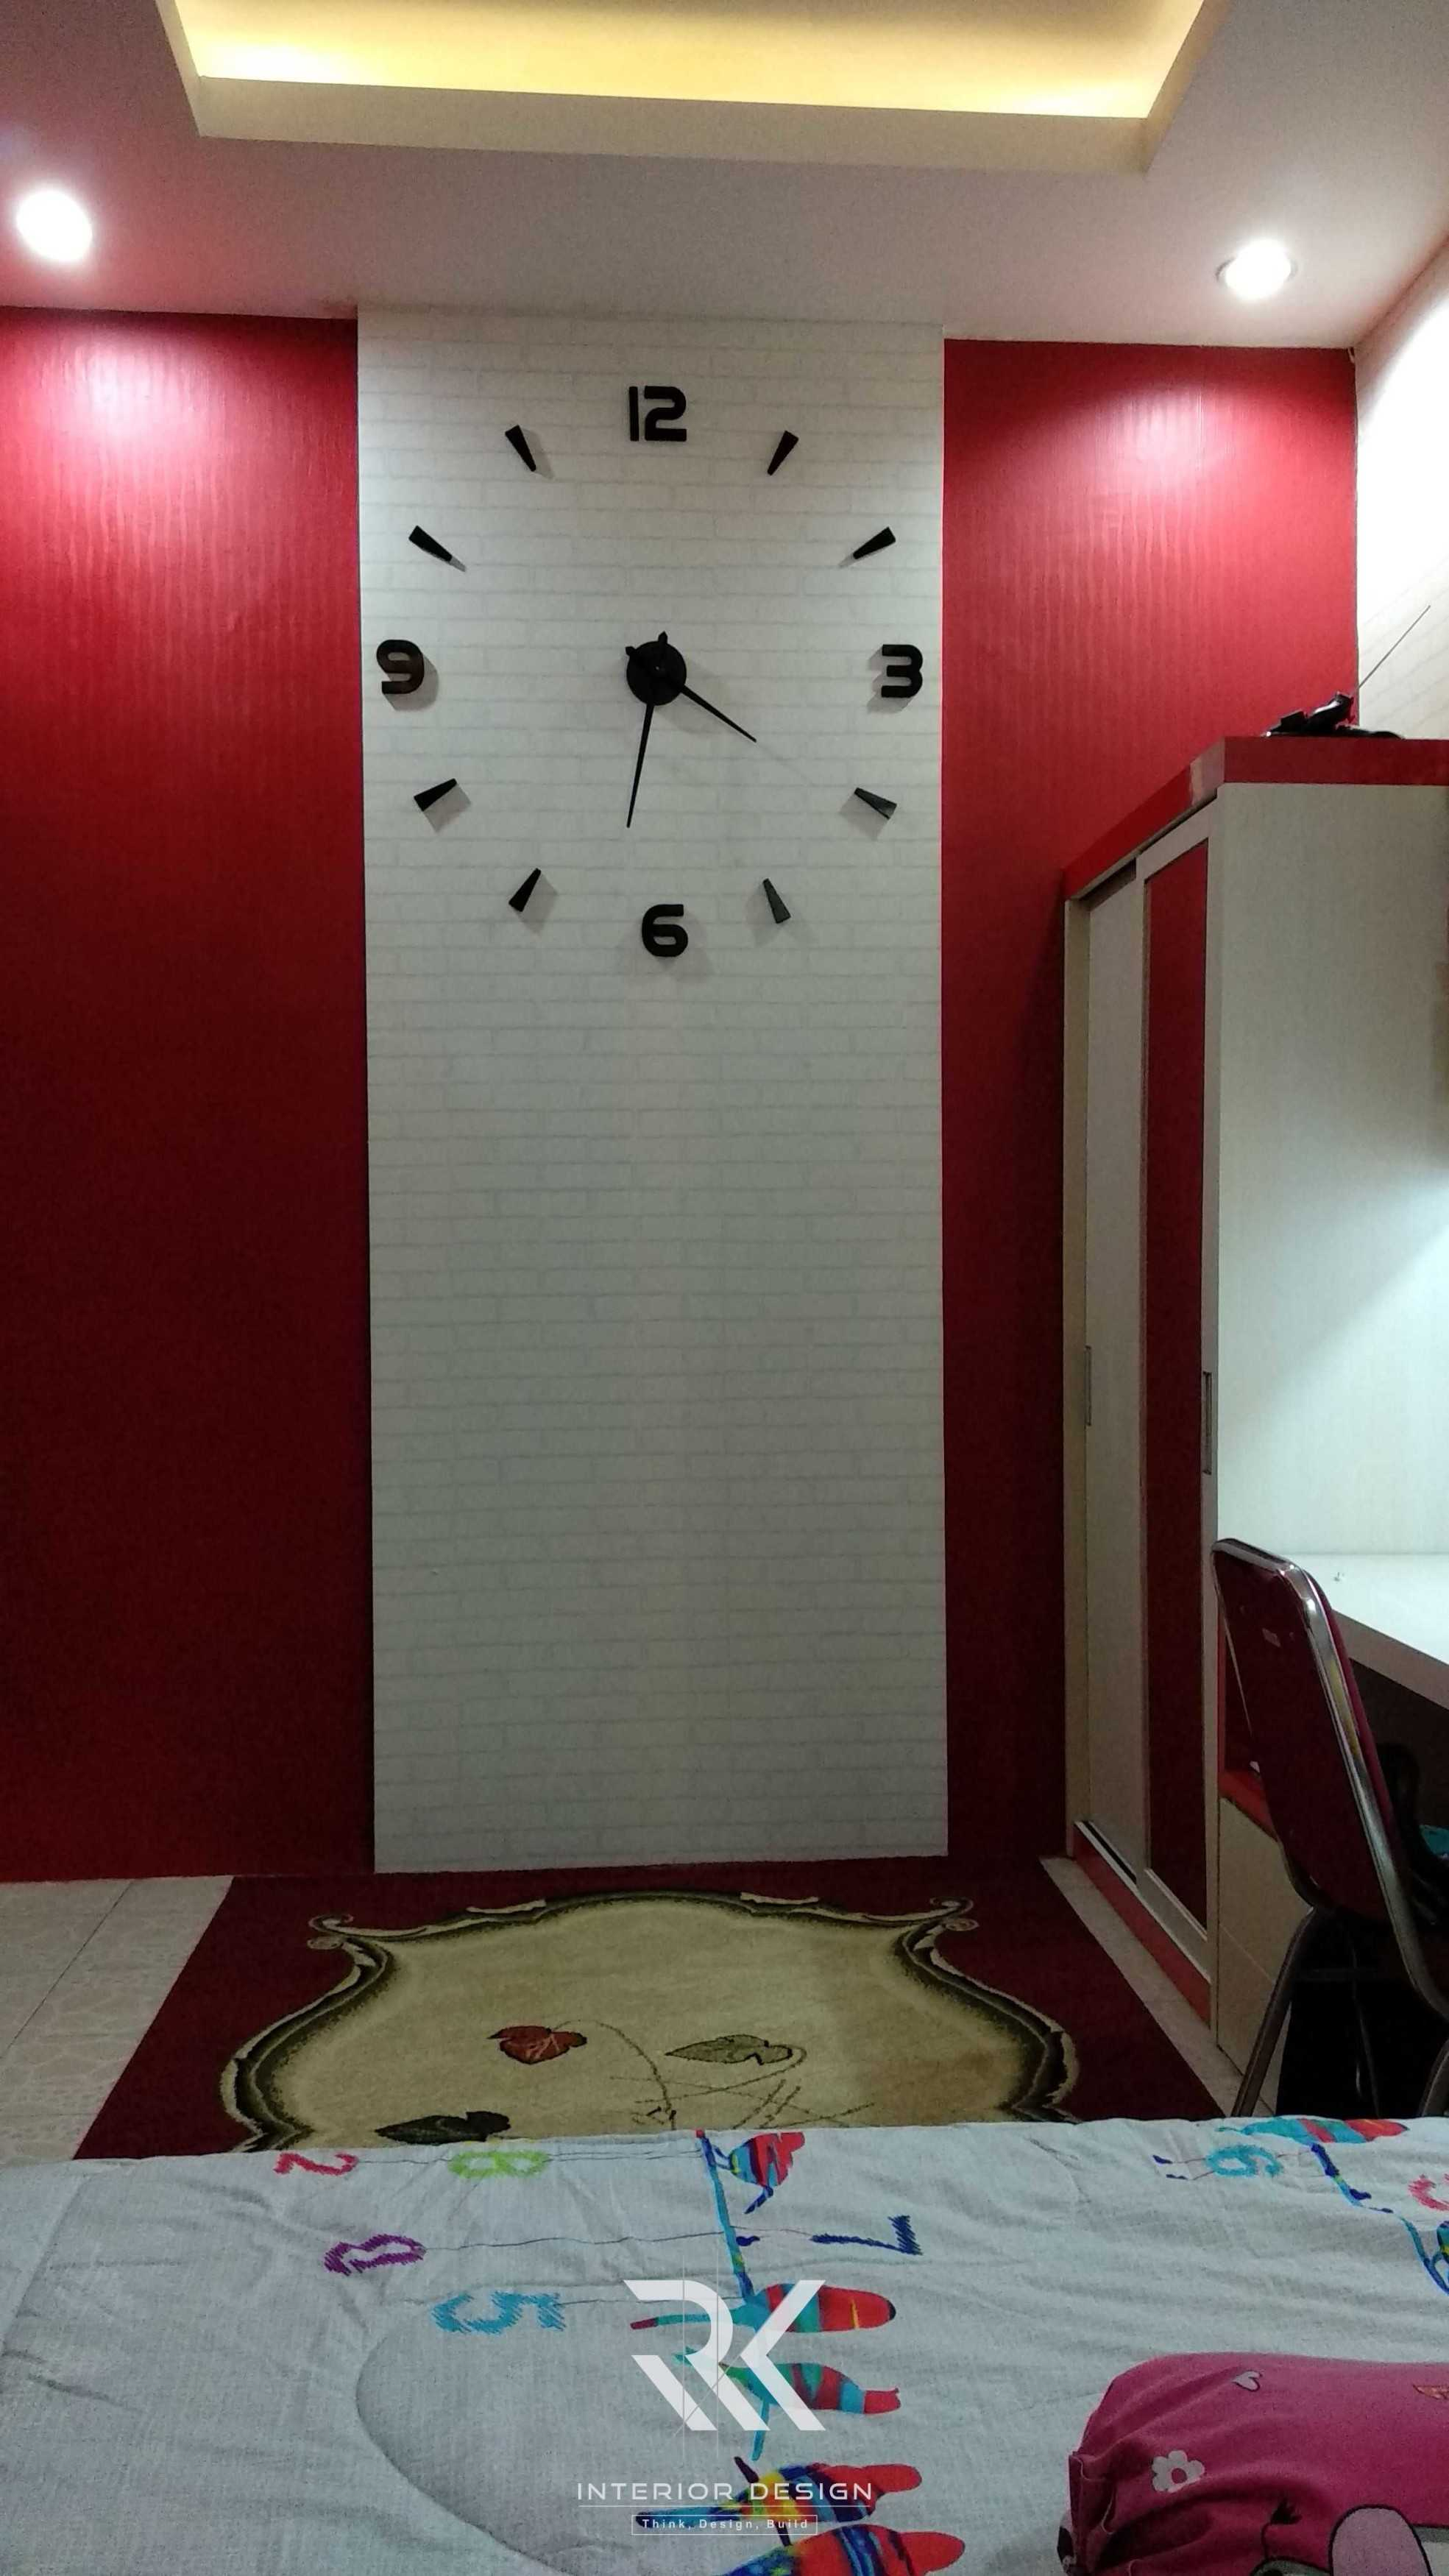 Rk Interior Bedroom Anak Kabupaten Purworejo, Jawa Tengah, Indonesia Kabupaten Purworejo, Jawa Tengah, Indonesia Rk-Interior-Bedroom-Anak   69531